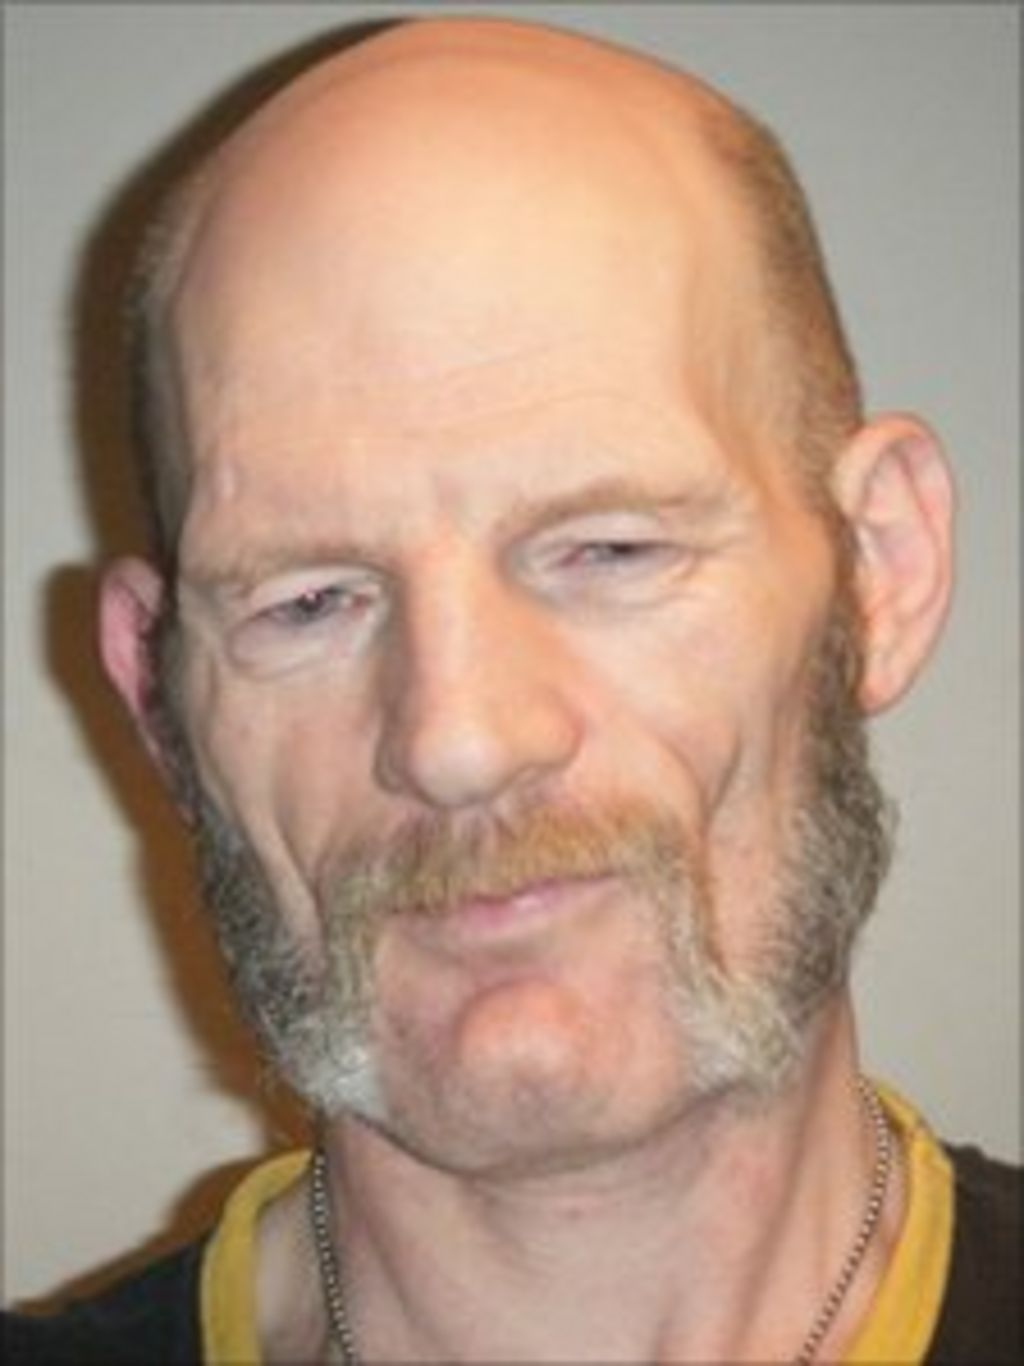 william roach sex offender in Nebraska